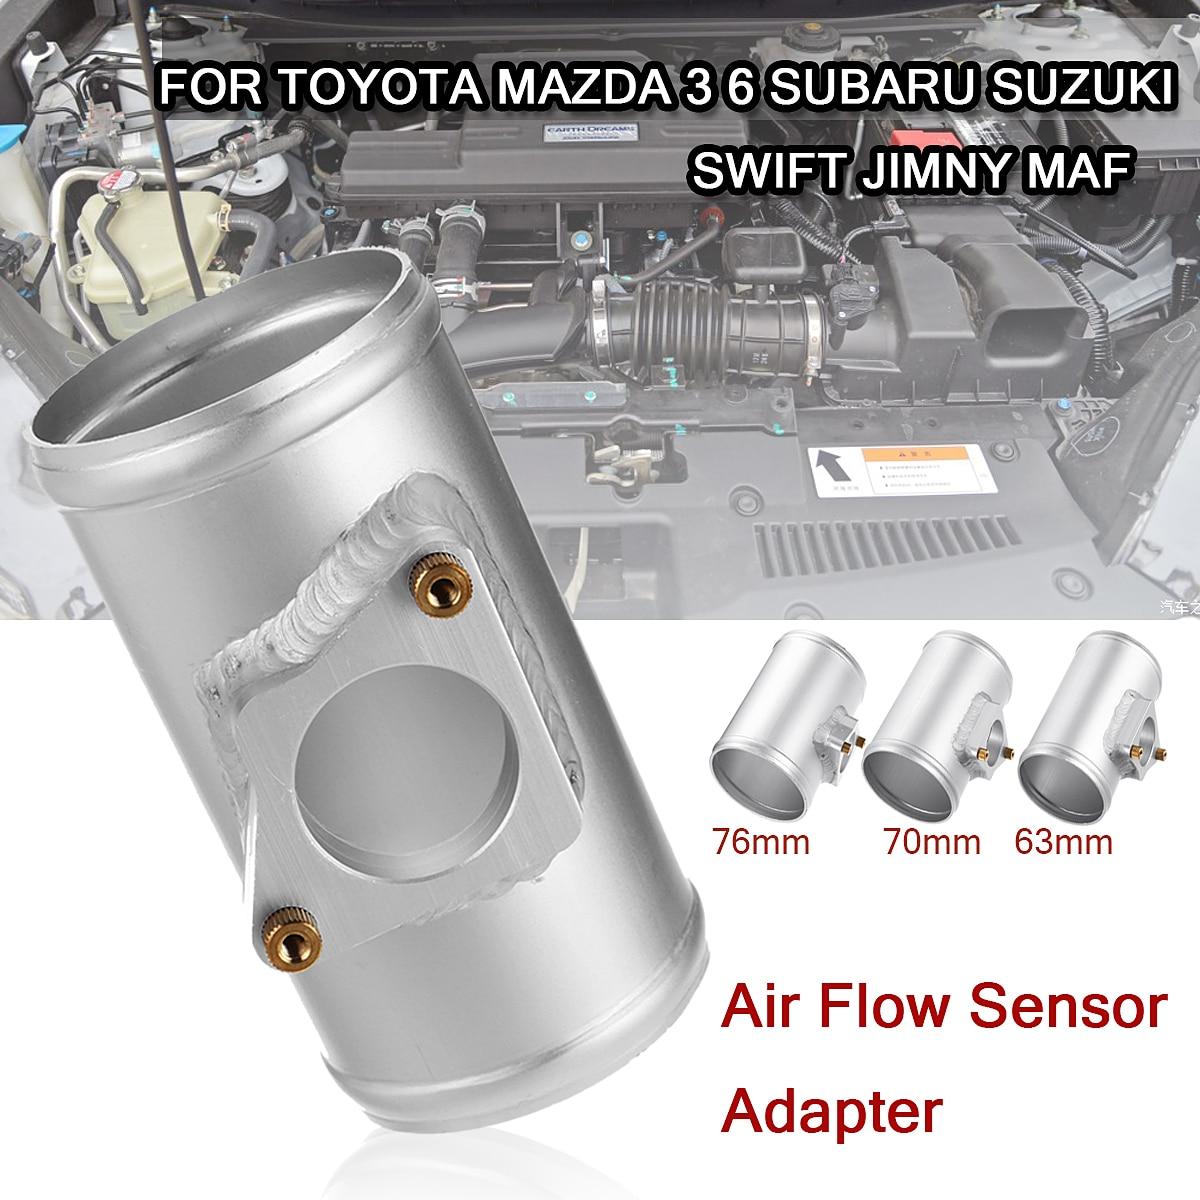 63/70/76mm Car Air Flow Sensor Adapter Performance Air Intake Meter Mount for Toyota/Mazda 3 6 for Subaru/Suzuki Swift